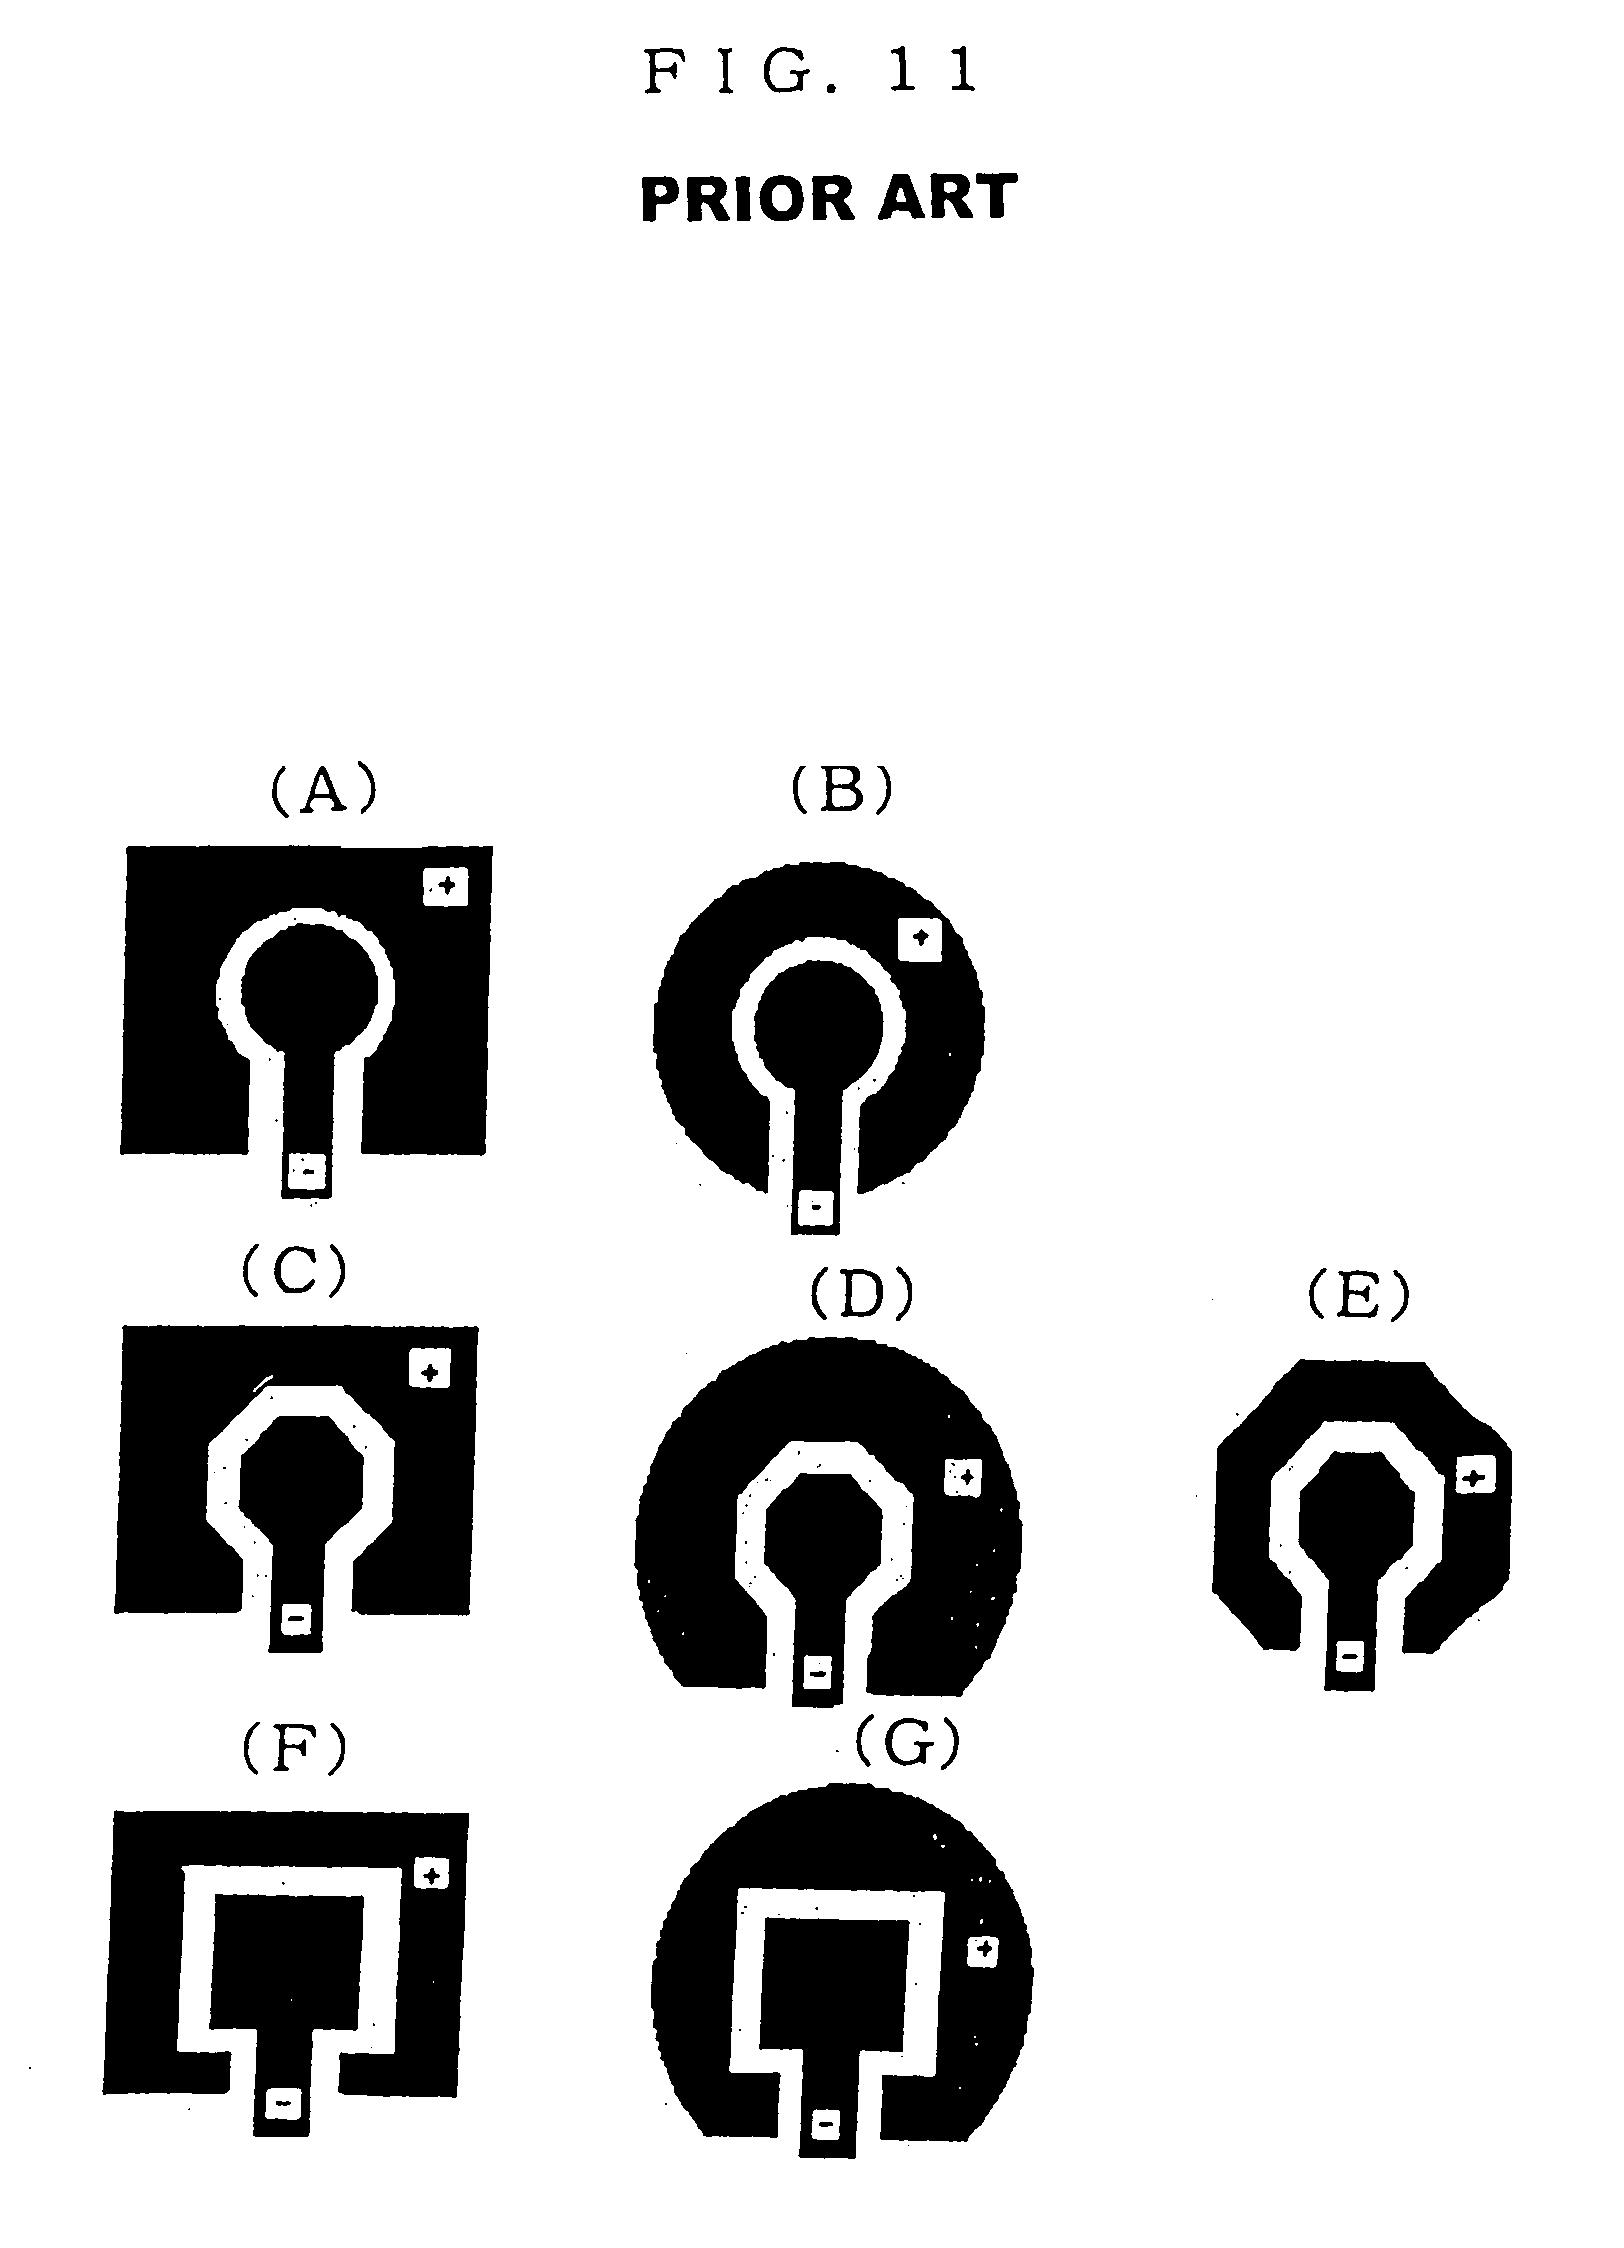 logo logo 标志 设计 矢量 矢量图 素材 图标 1624_2248 竖版 竖屏